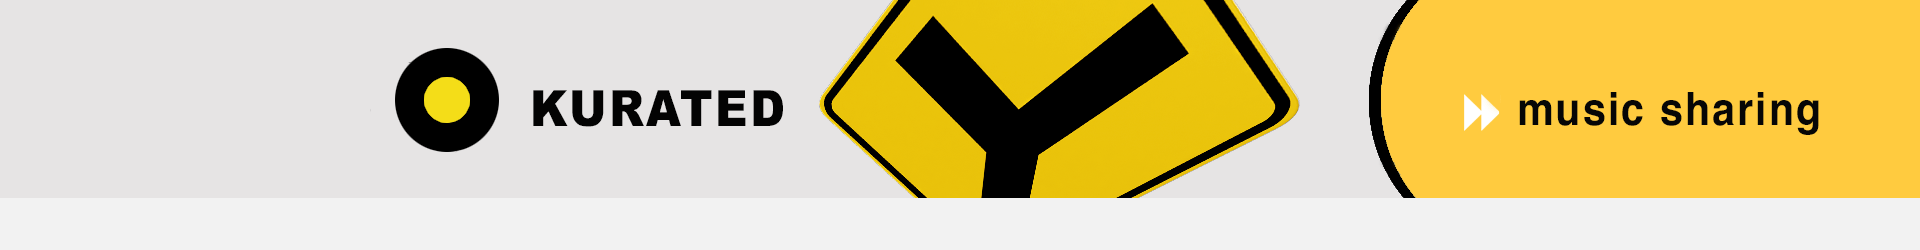 149 Kurated Banner Y Sign V2